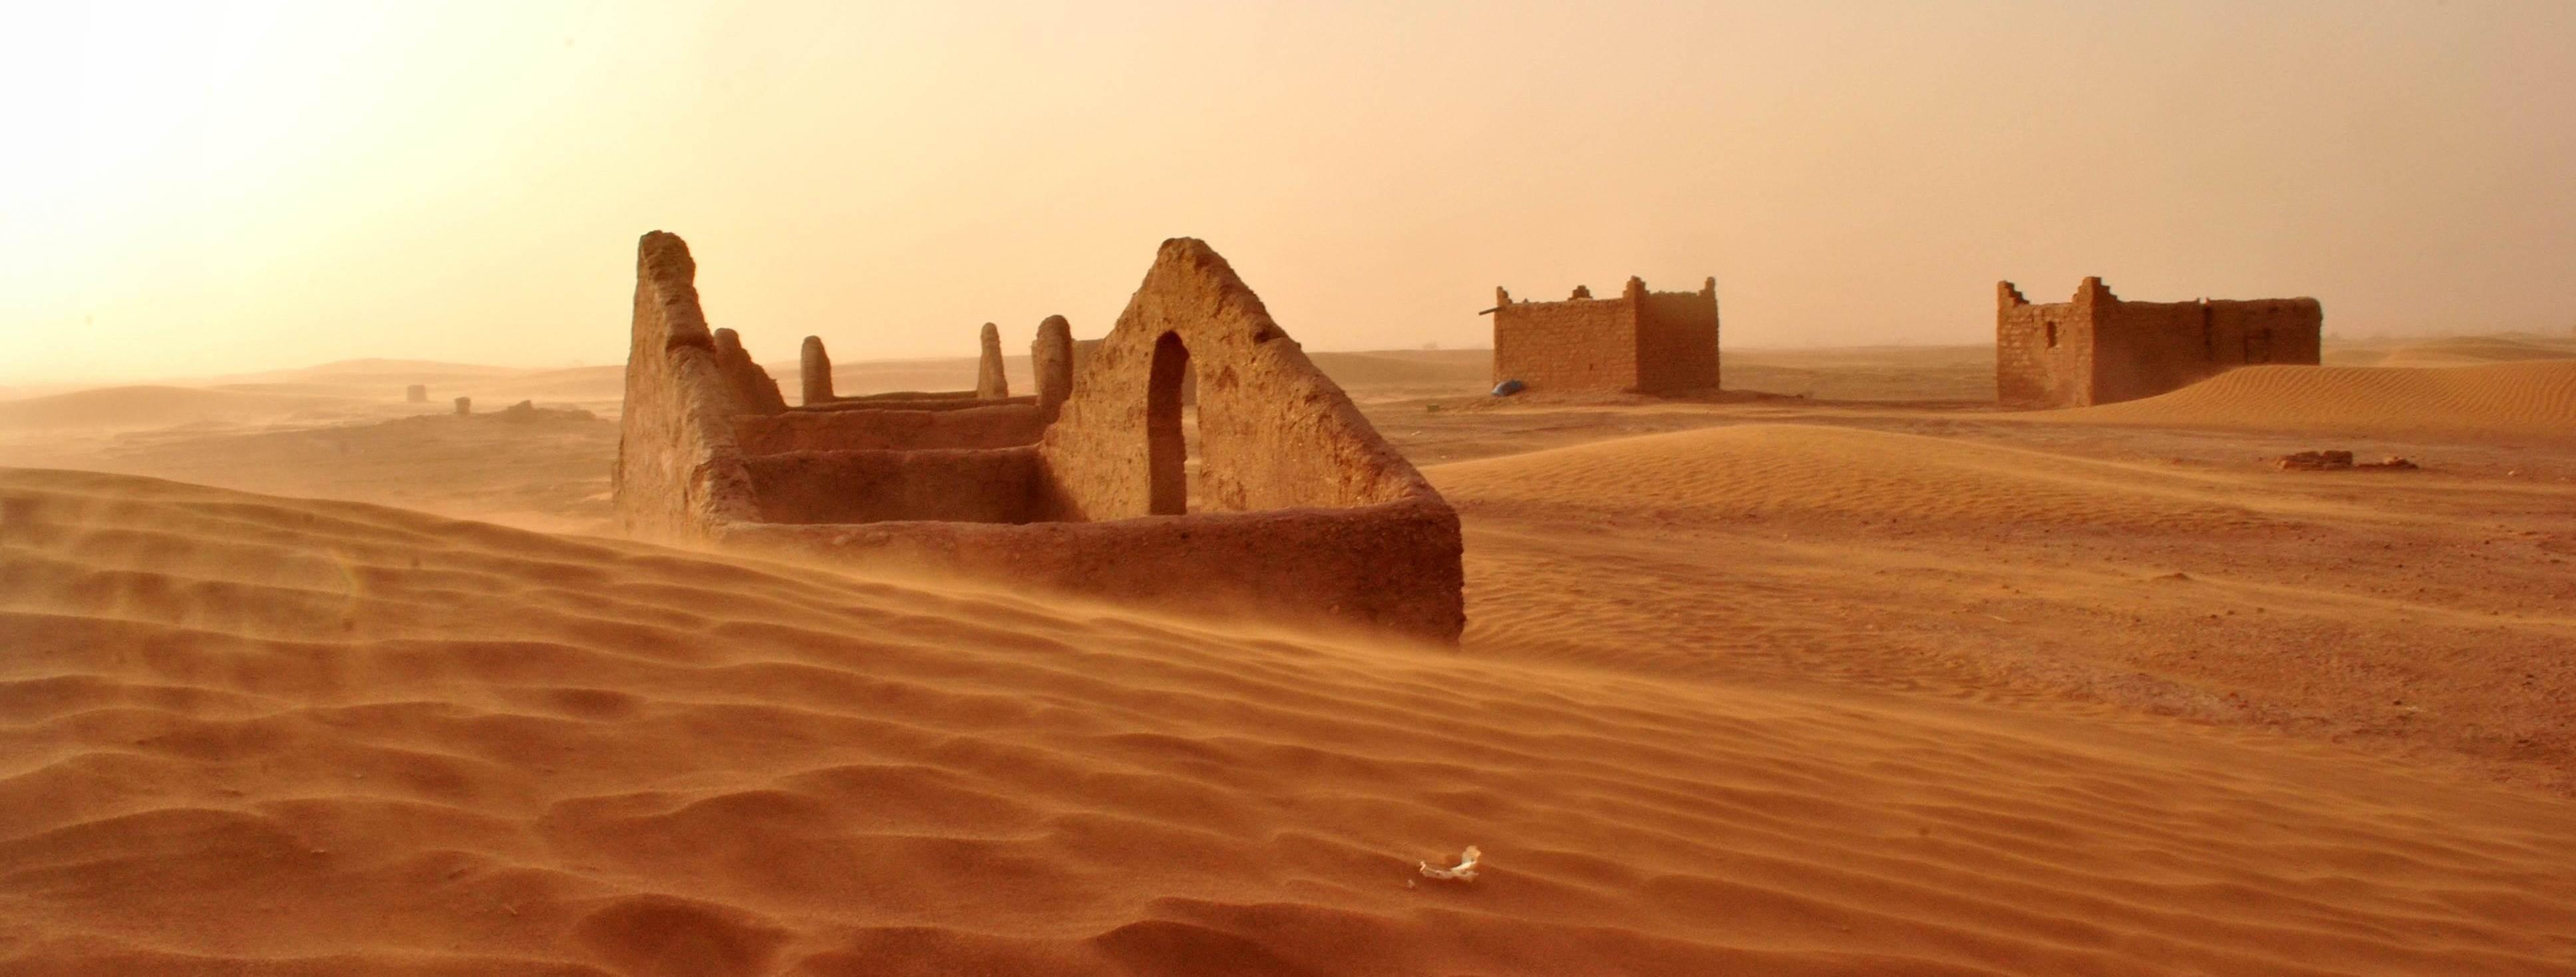 Sahara piaski pustyni dawna wioska Maroko